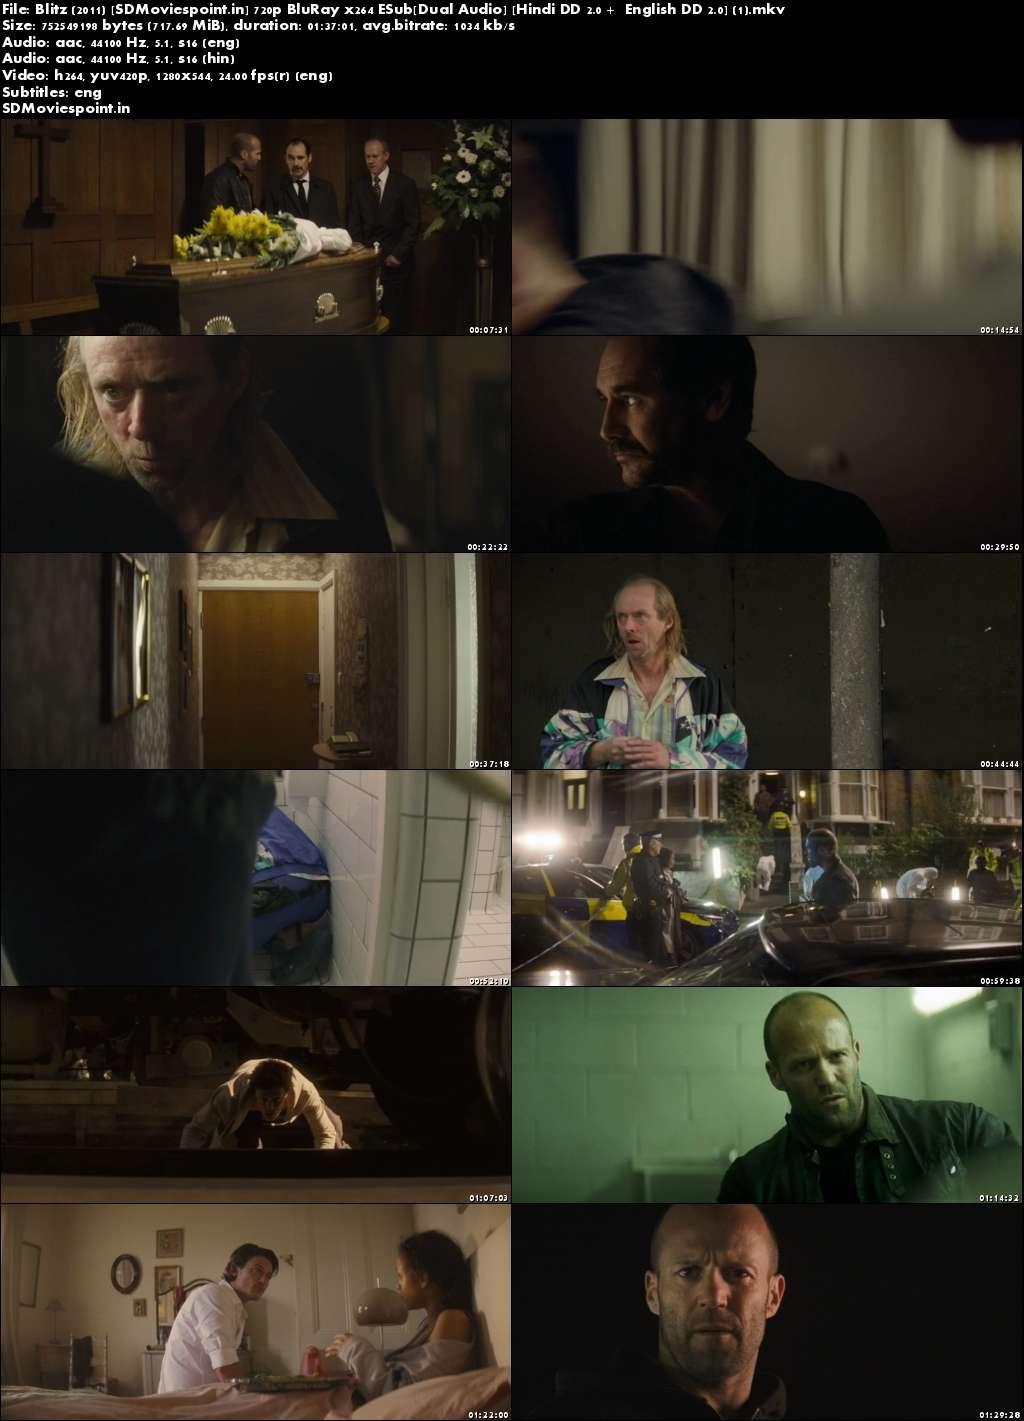 Screen Shots Blitz 2011 HD Movie Trailer Full Movie Download Free Dual Audio